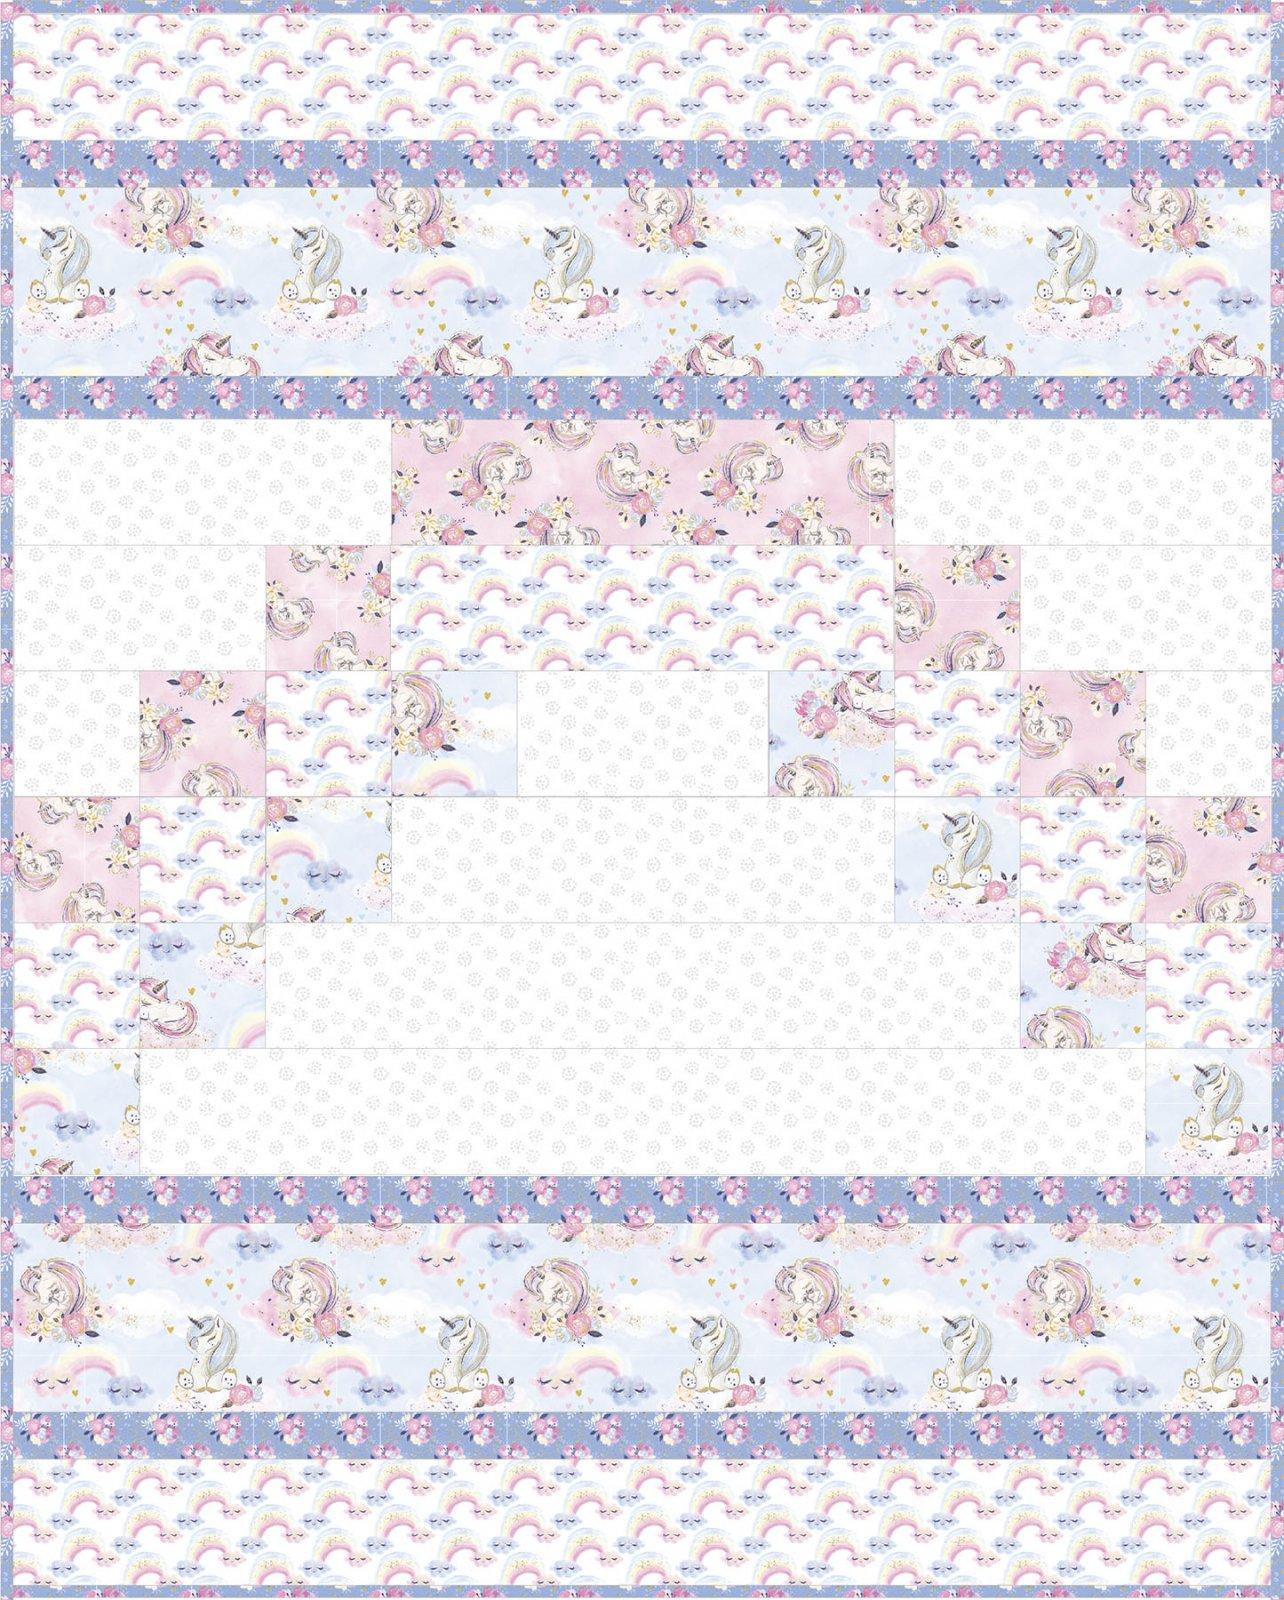 3 Wishes Fabric<br>Unicorn Utopia Quilt